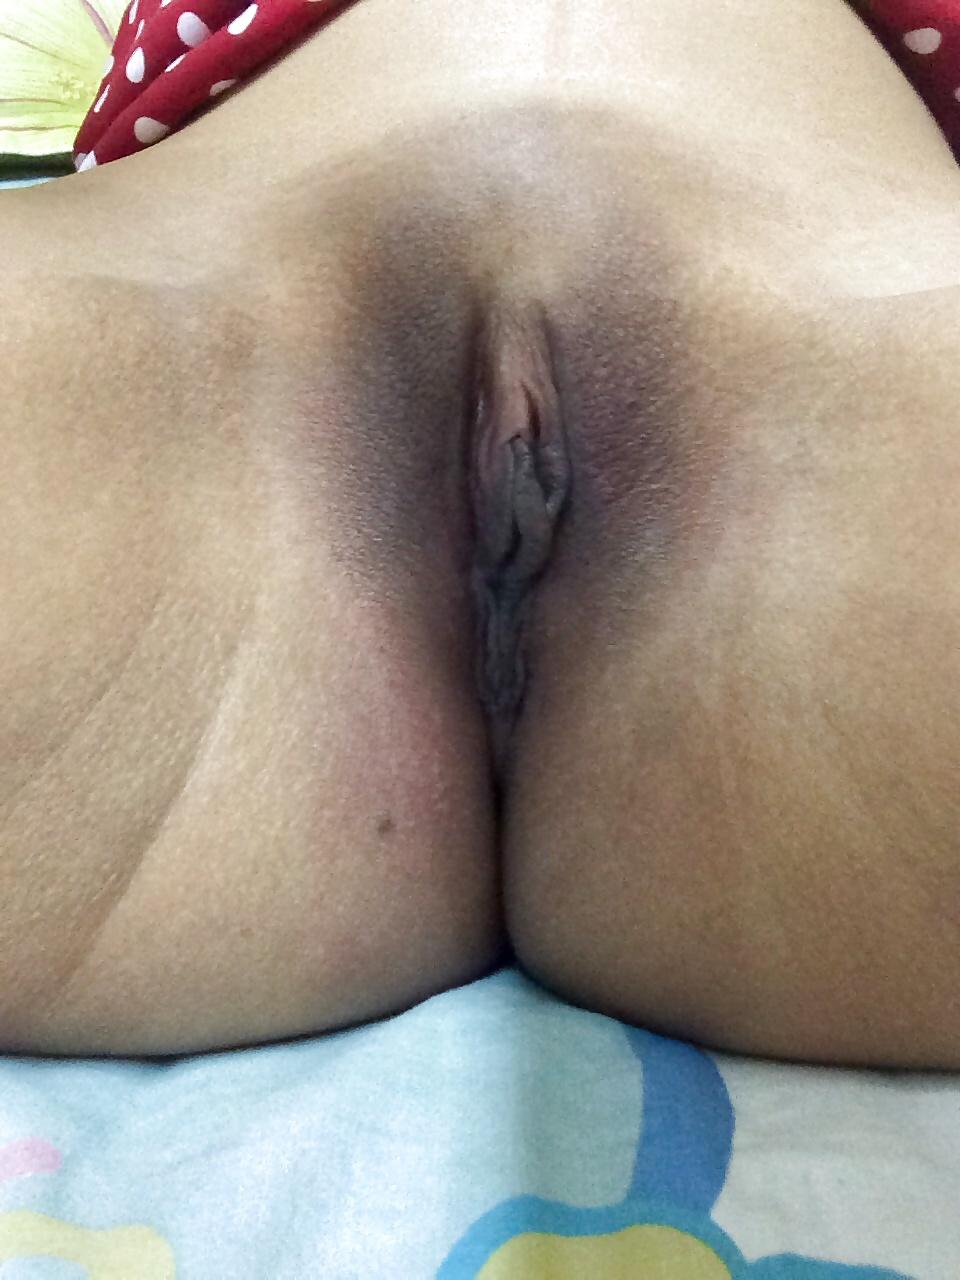 Myanmar sex pussy model girl photo